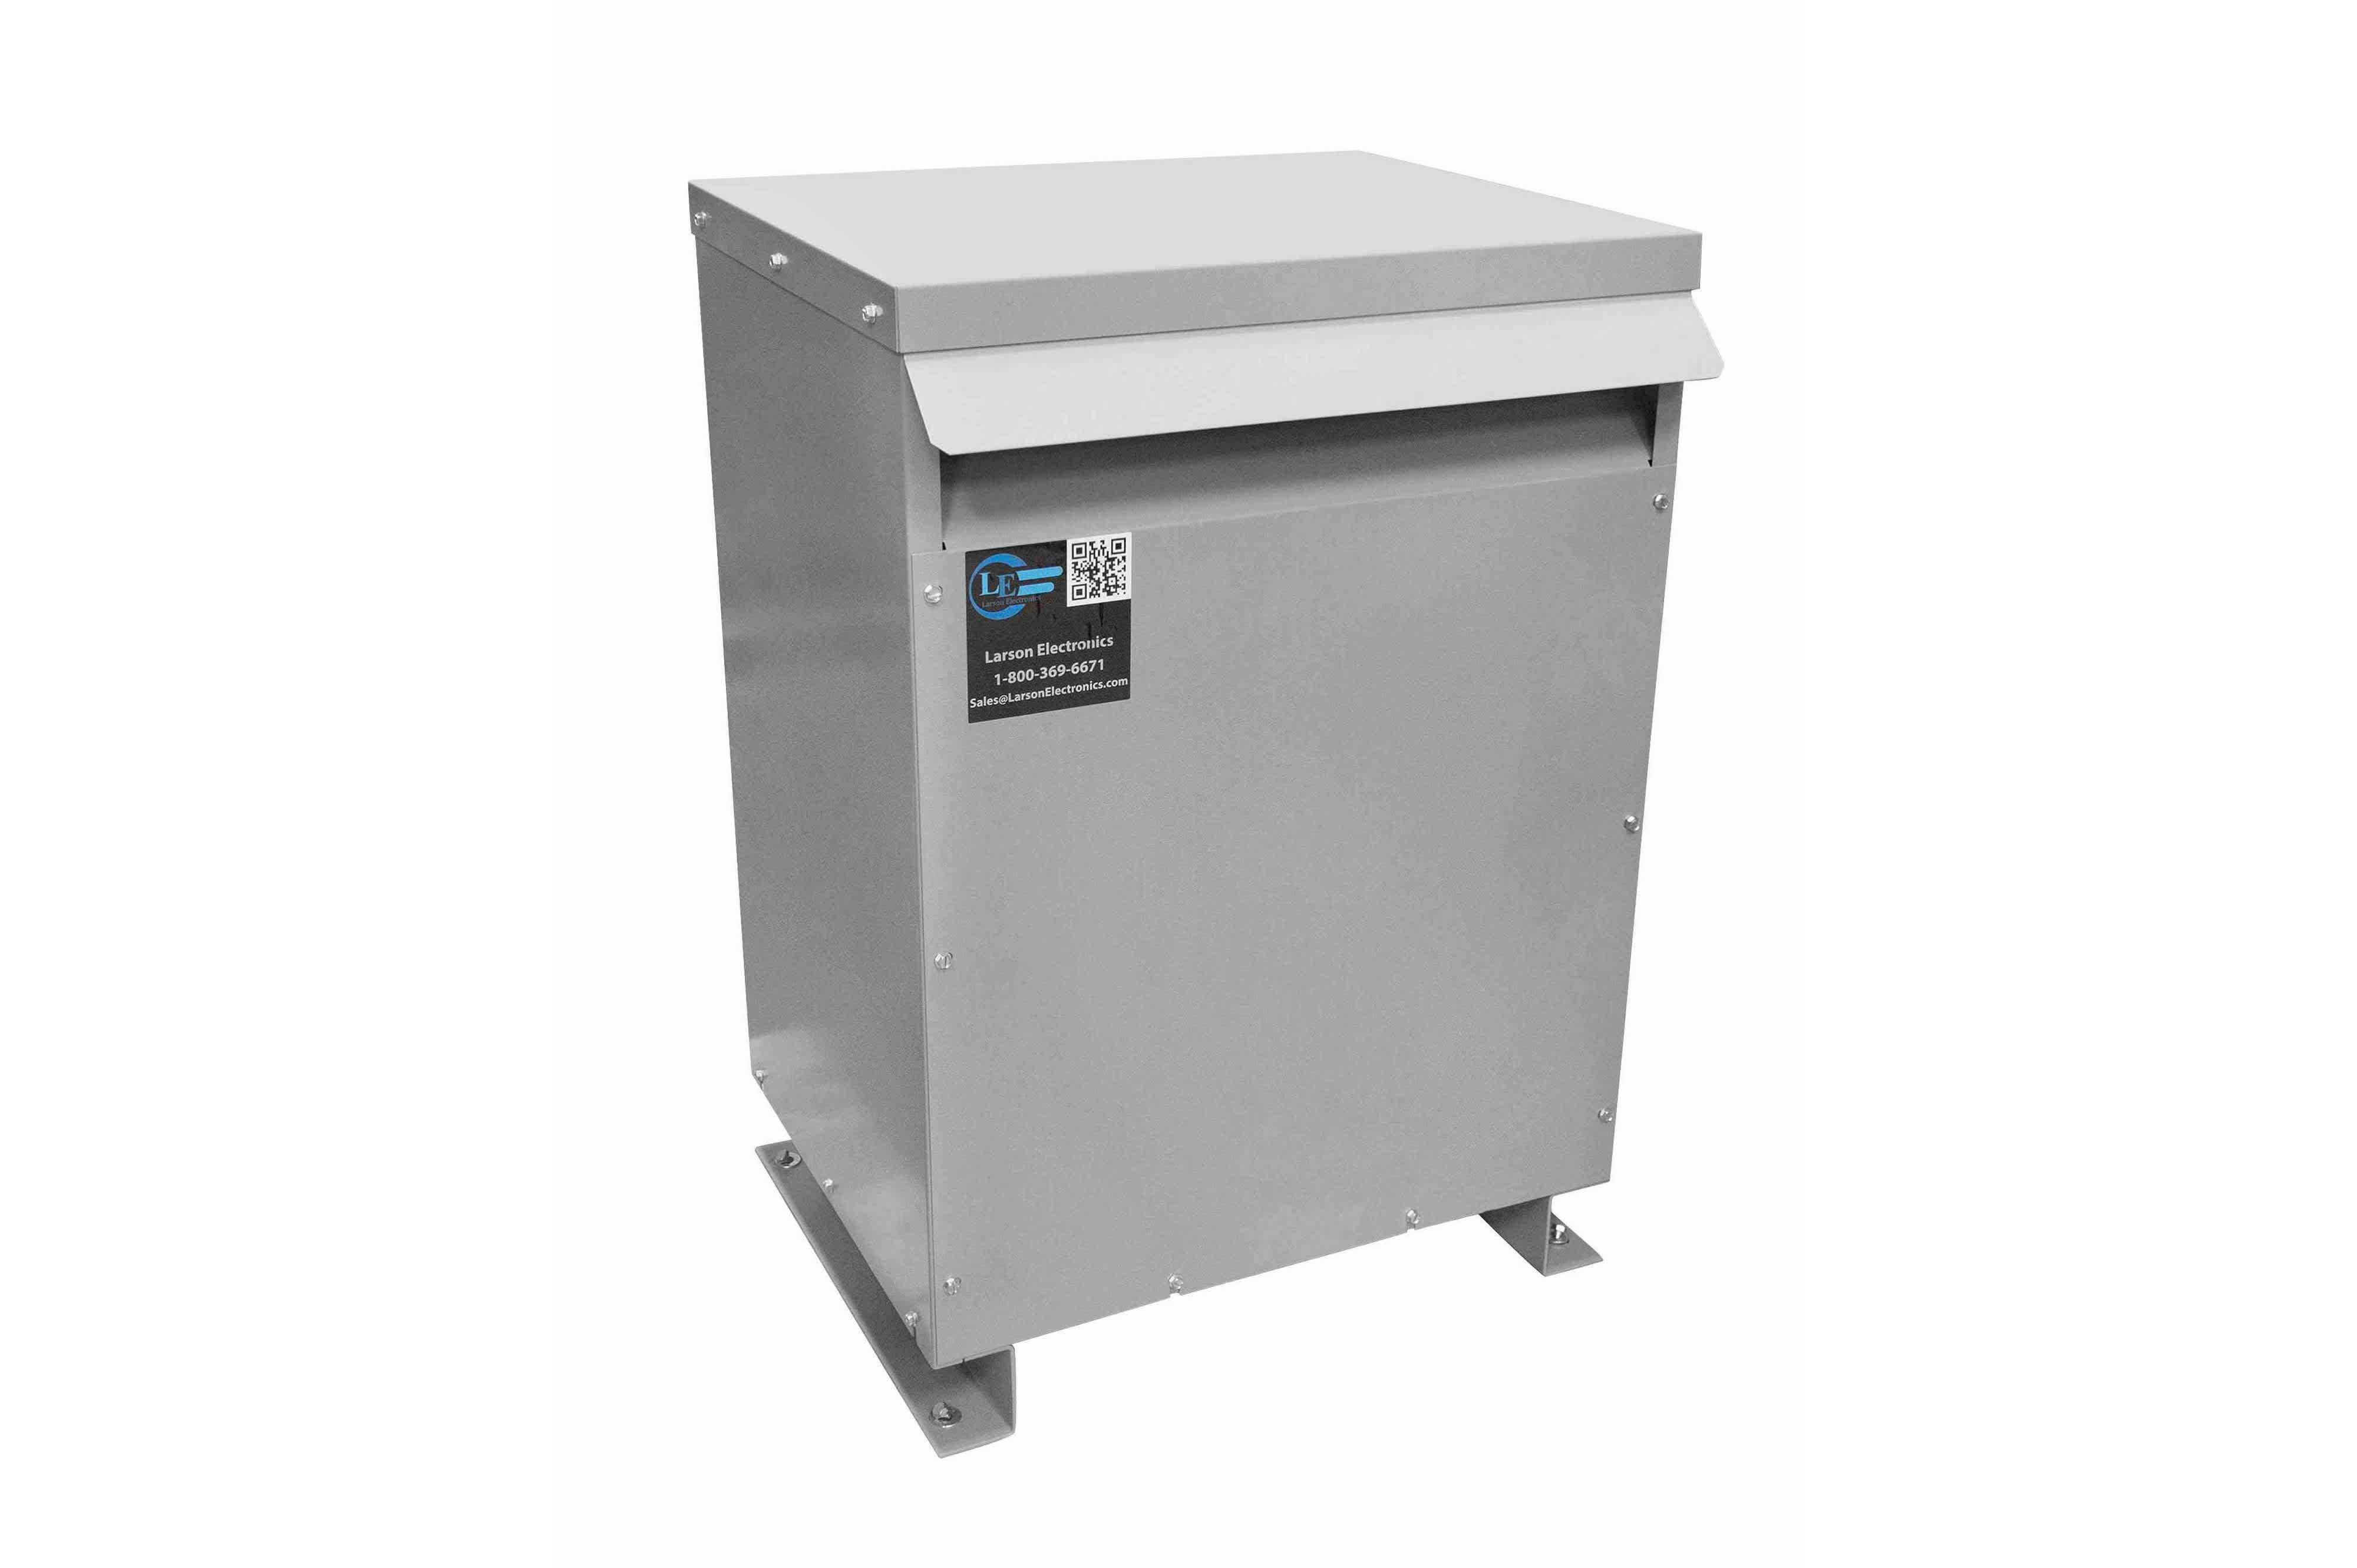 55 kVA 3PH Isolation Transformer, 240V Wye Primary, 600Y/347 Wye-N Secondary, N3R, Ventilated, 60 Hz